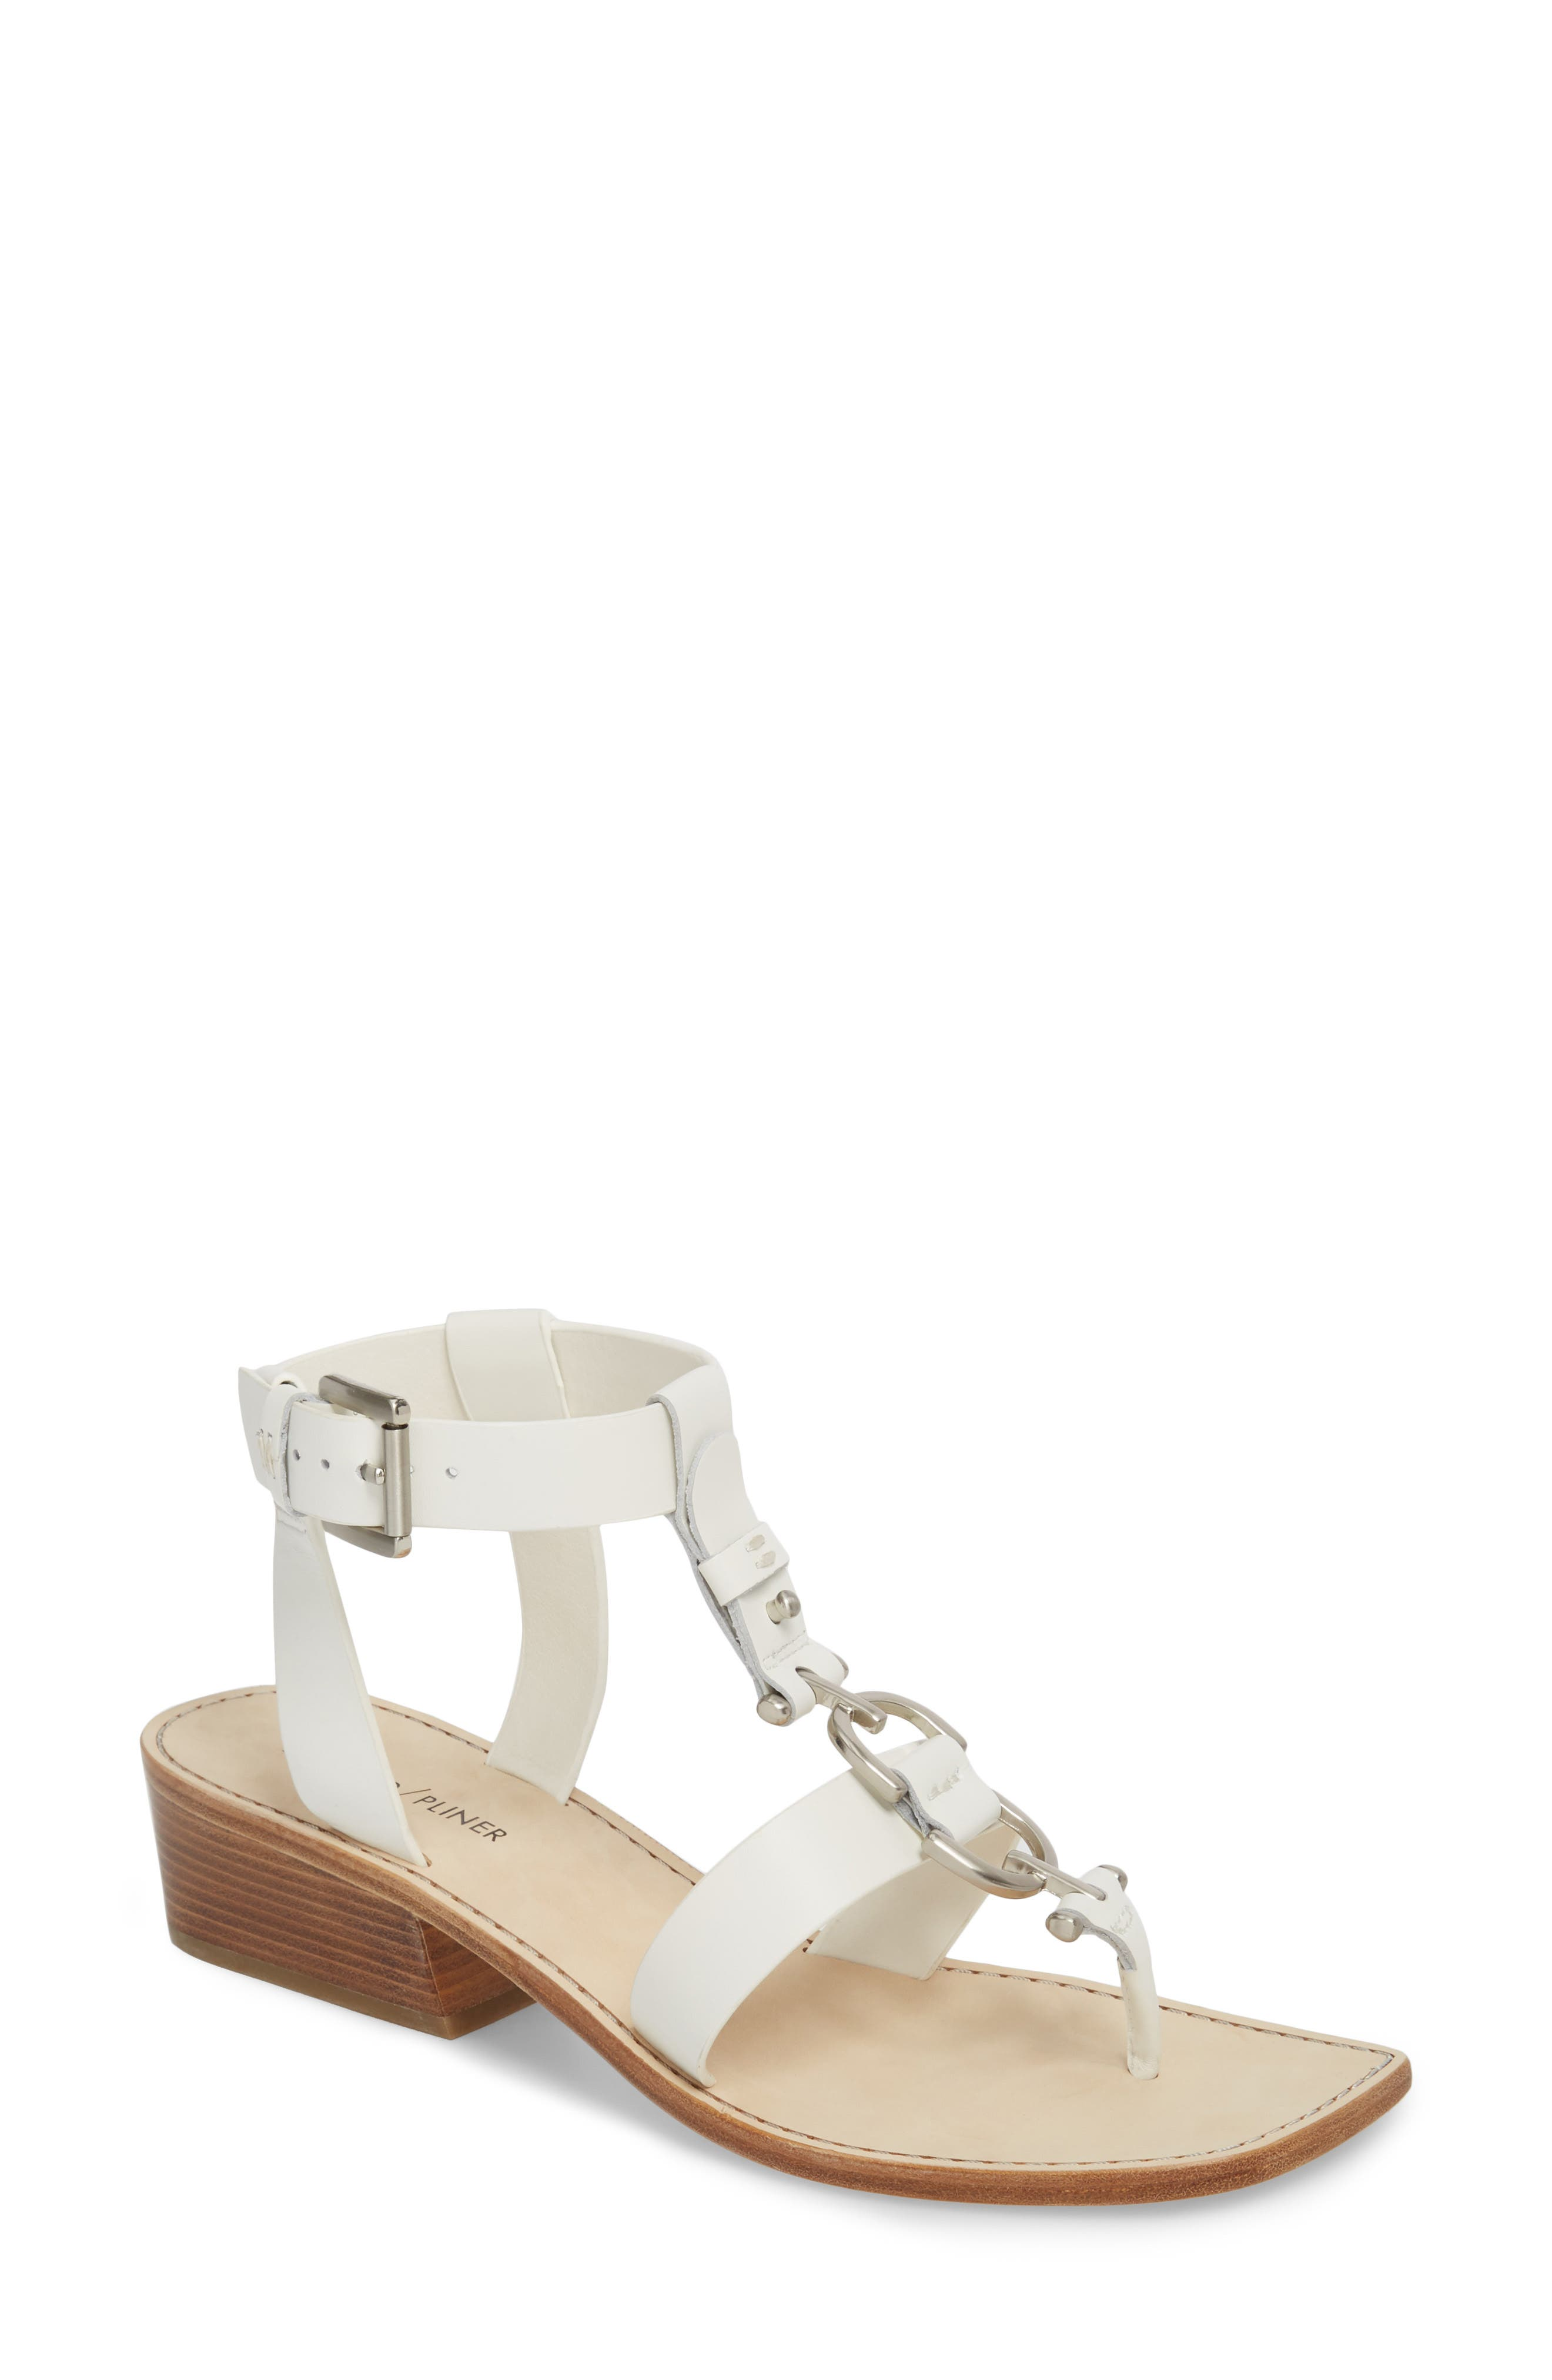 Dena Sandal,                         Main,                         color, Bone Leather